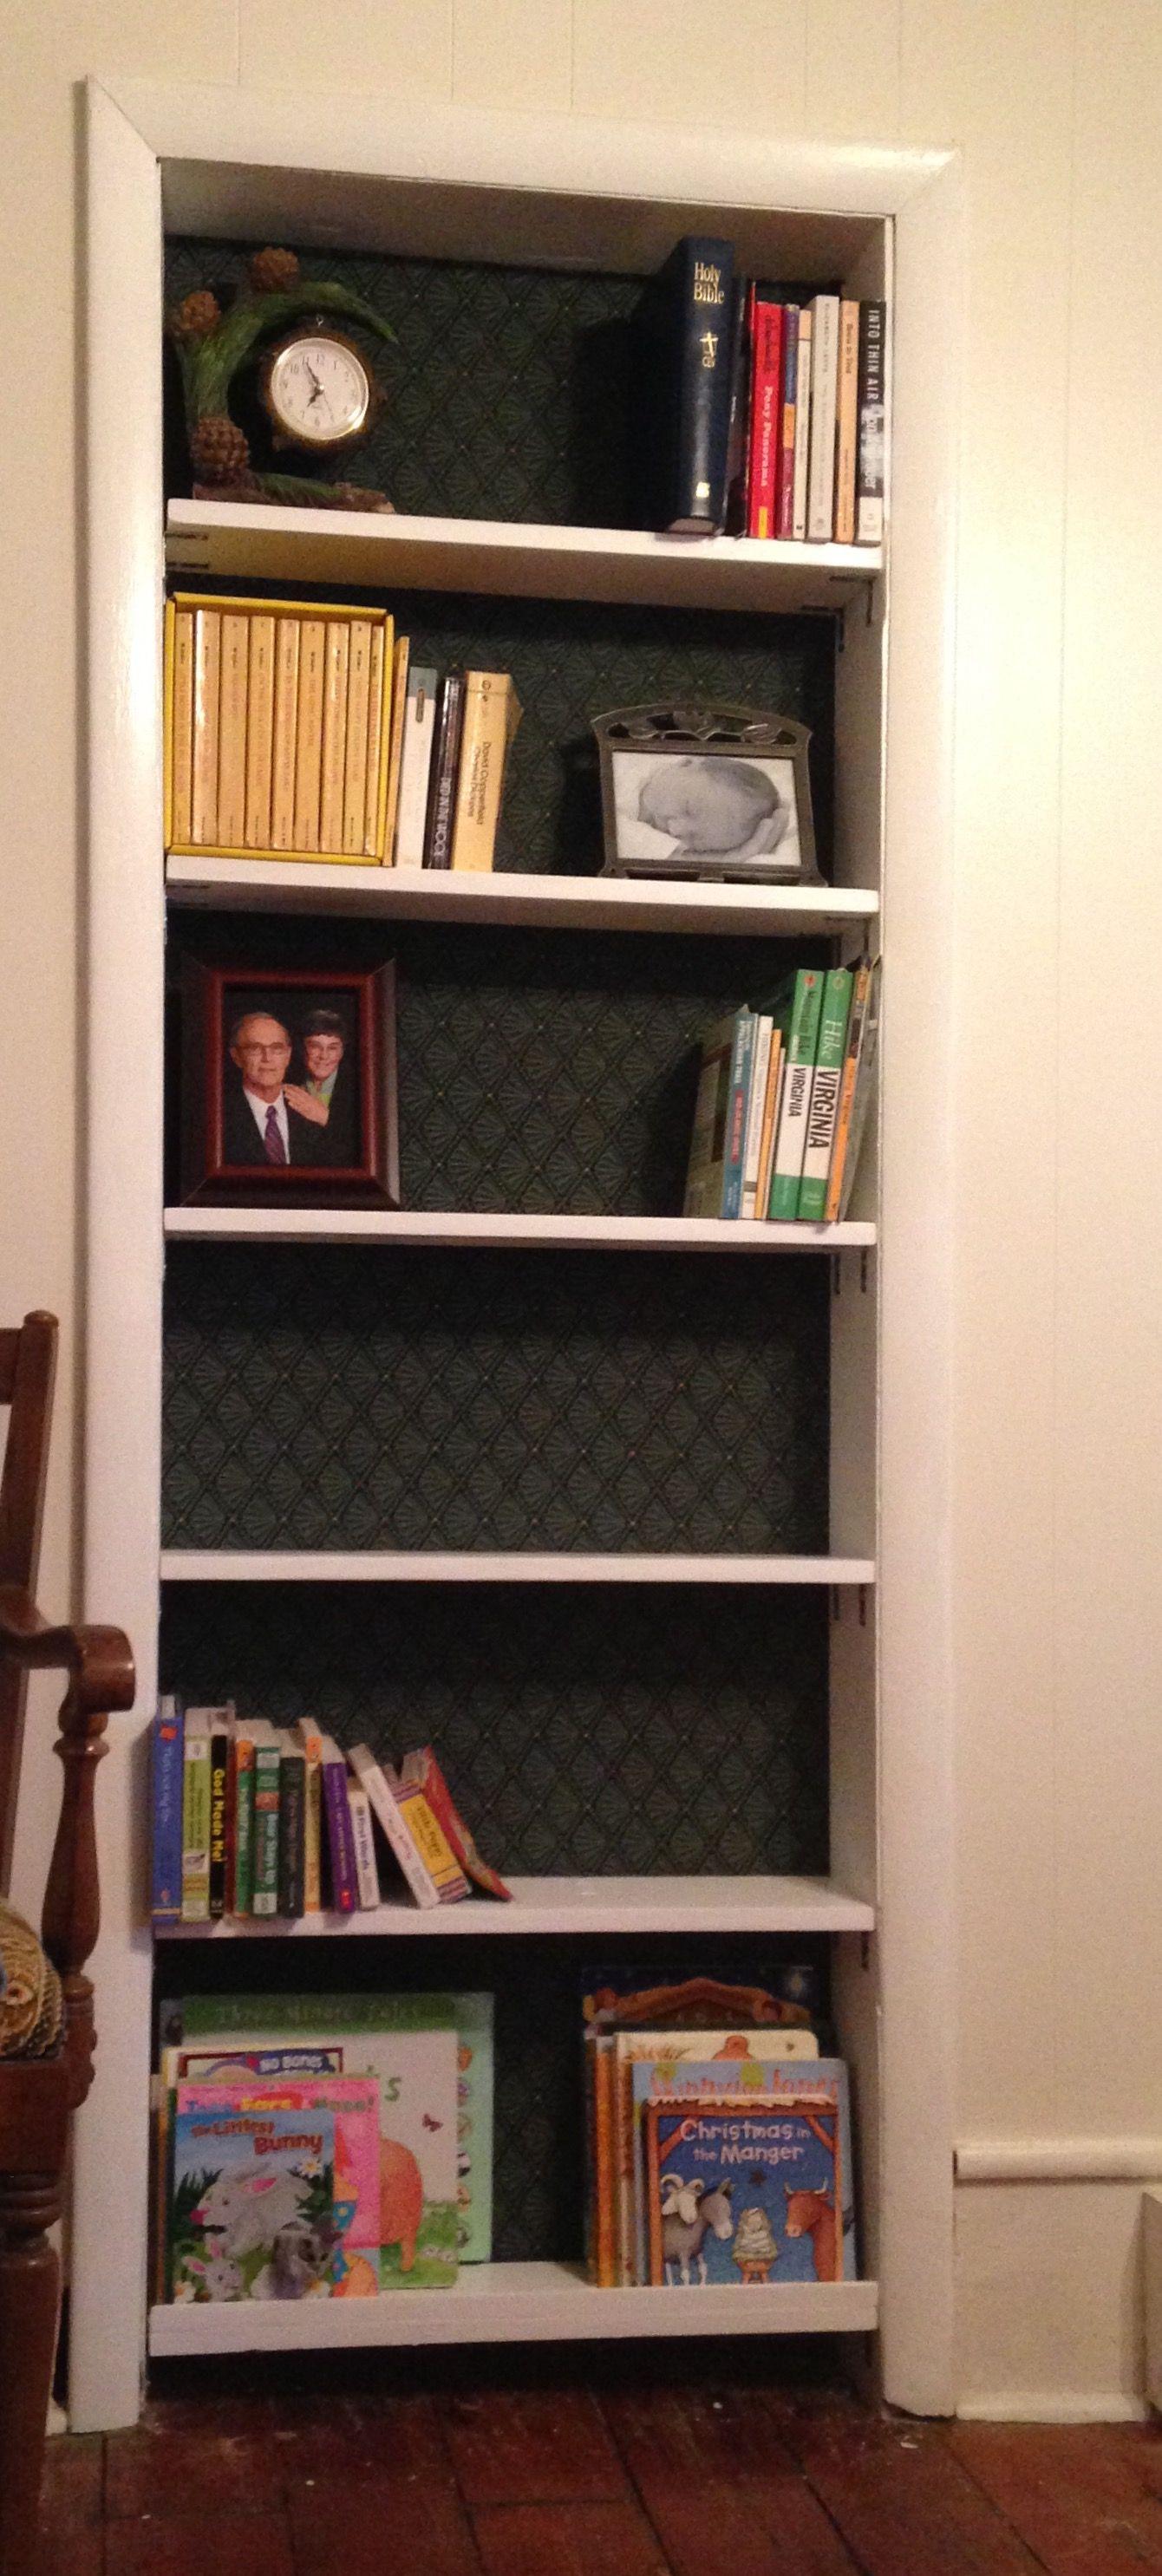 beachcrest bookcase home pdx mouzon bookcases wayfair furniture enclosed reviews